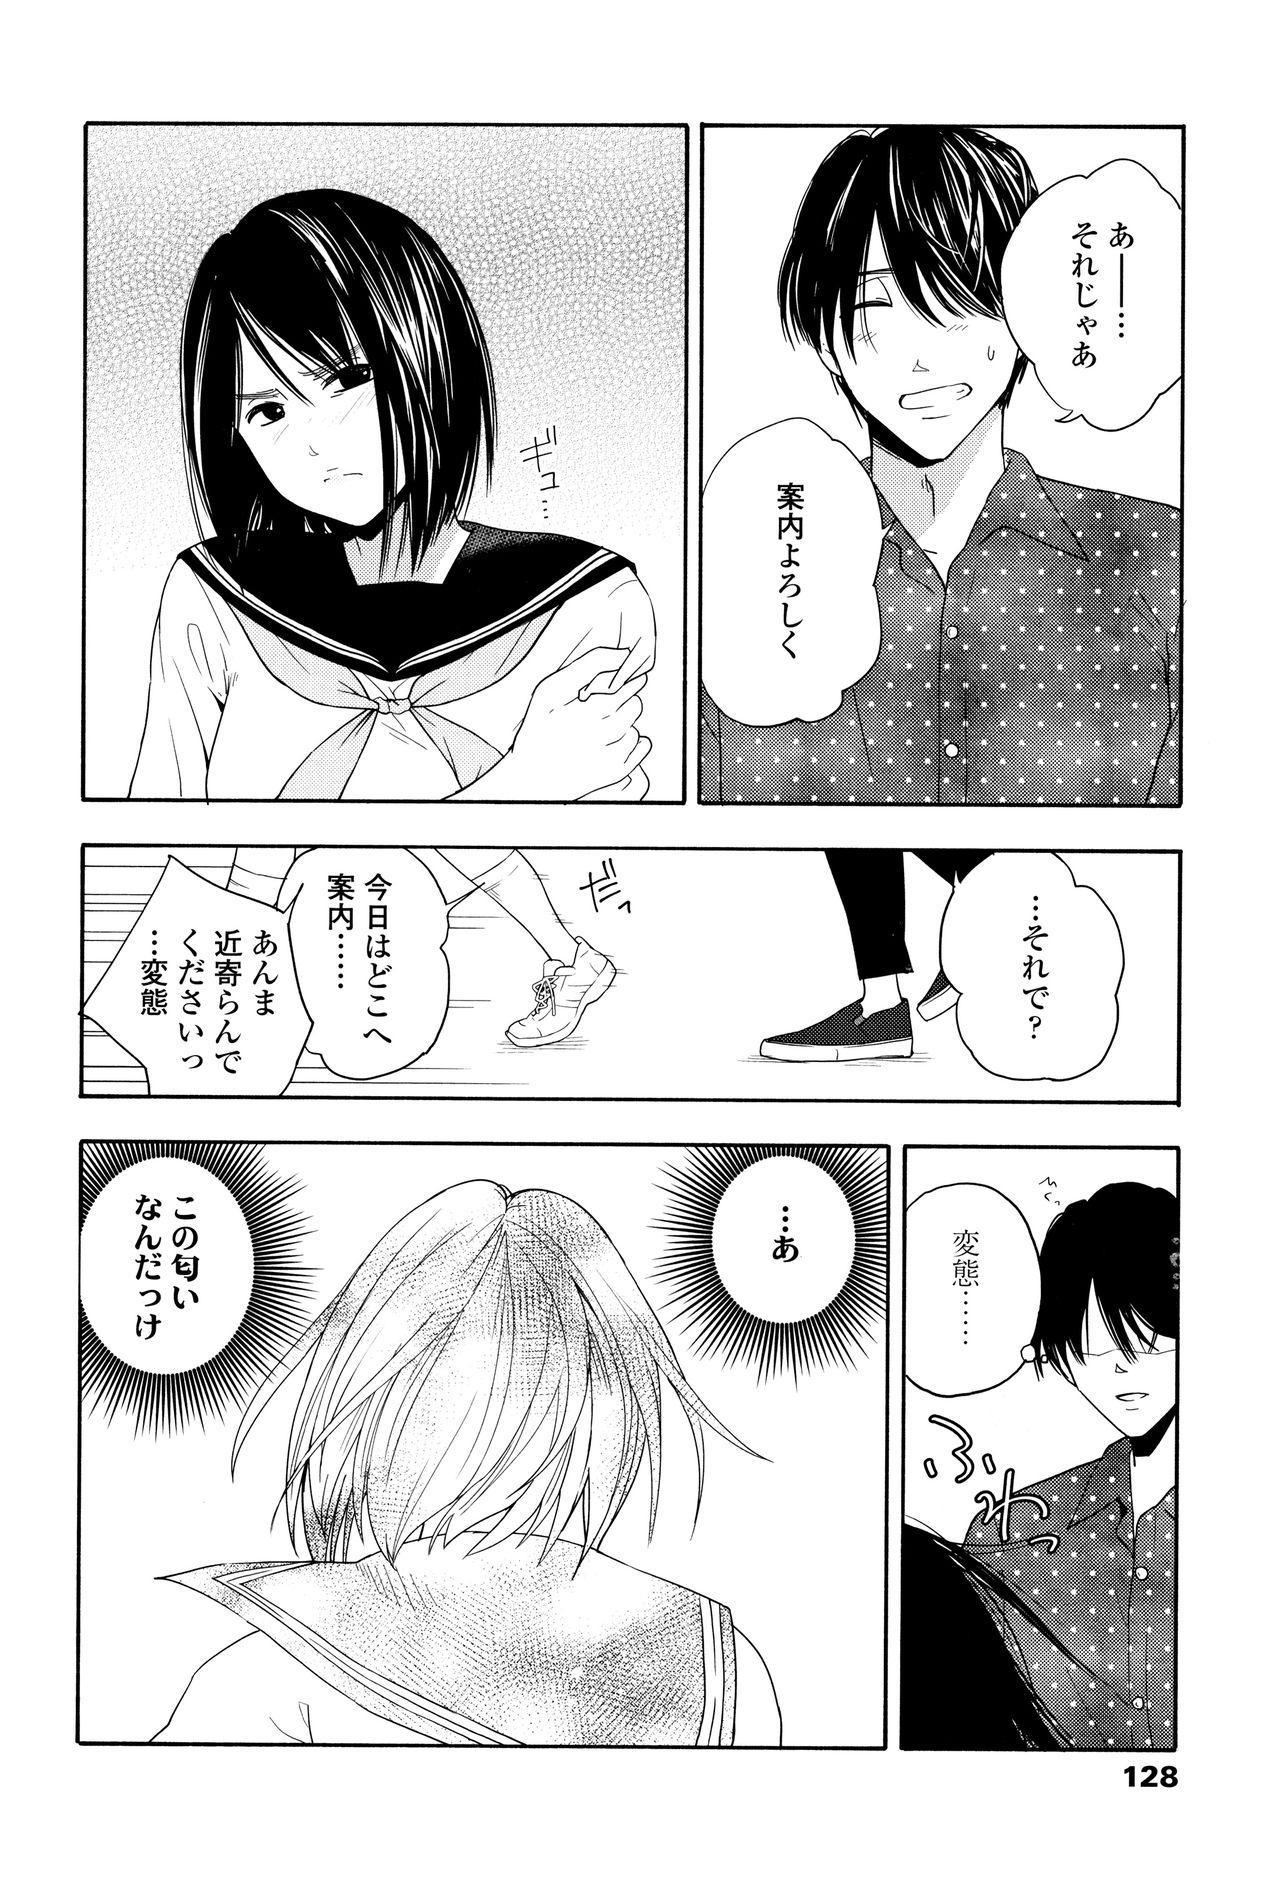 Shishunki no Eros - puberty eros 130